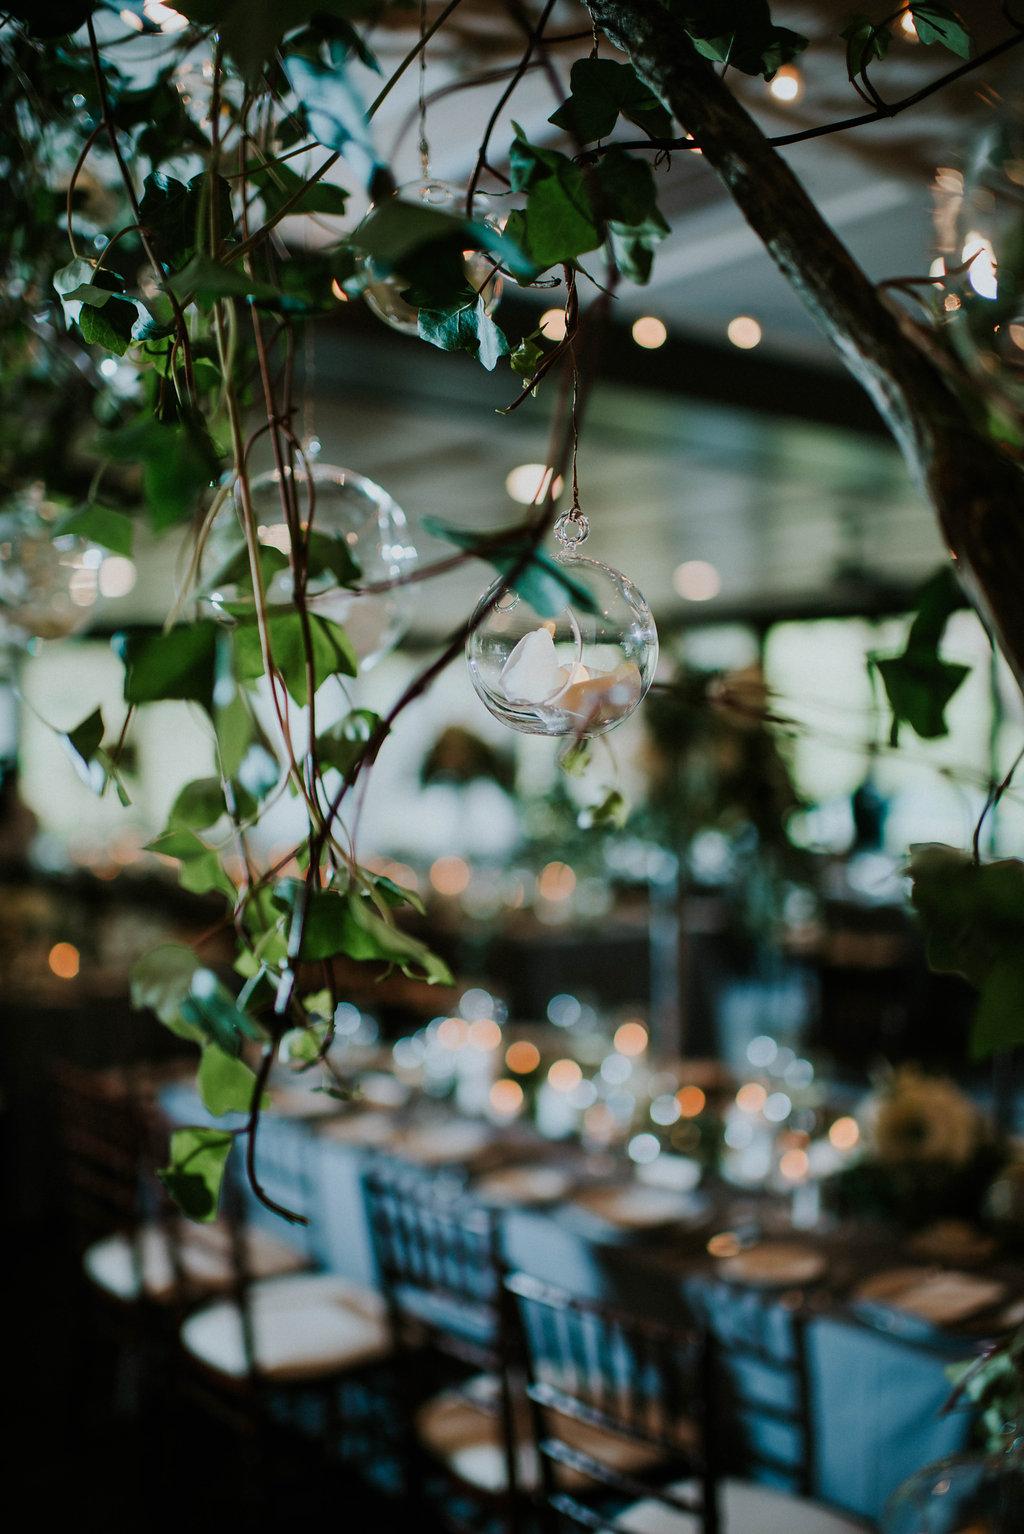 HillbrookClub_Wedding_Cleveland_Jessica+Dani_M+JPhoto-743.JPG